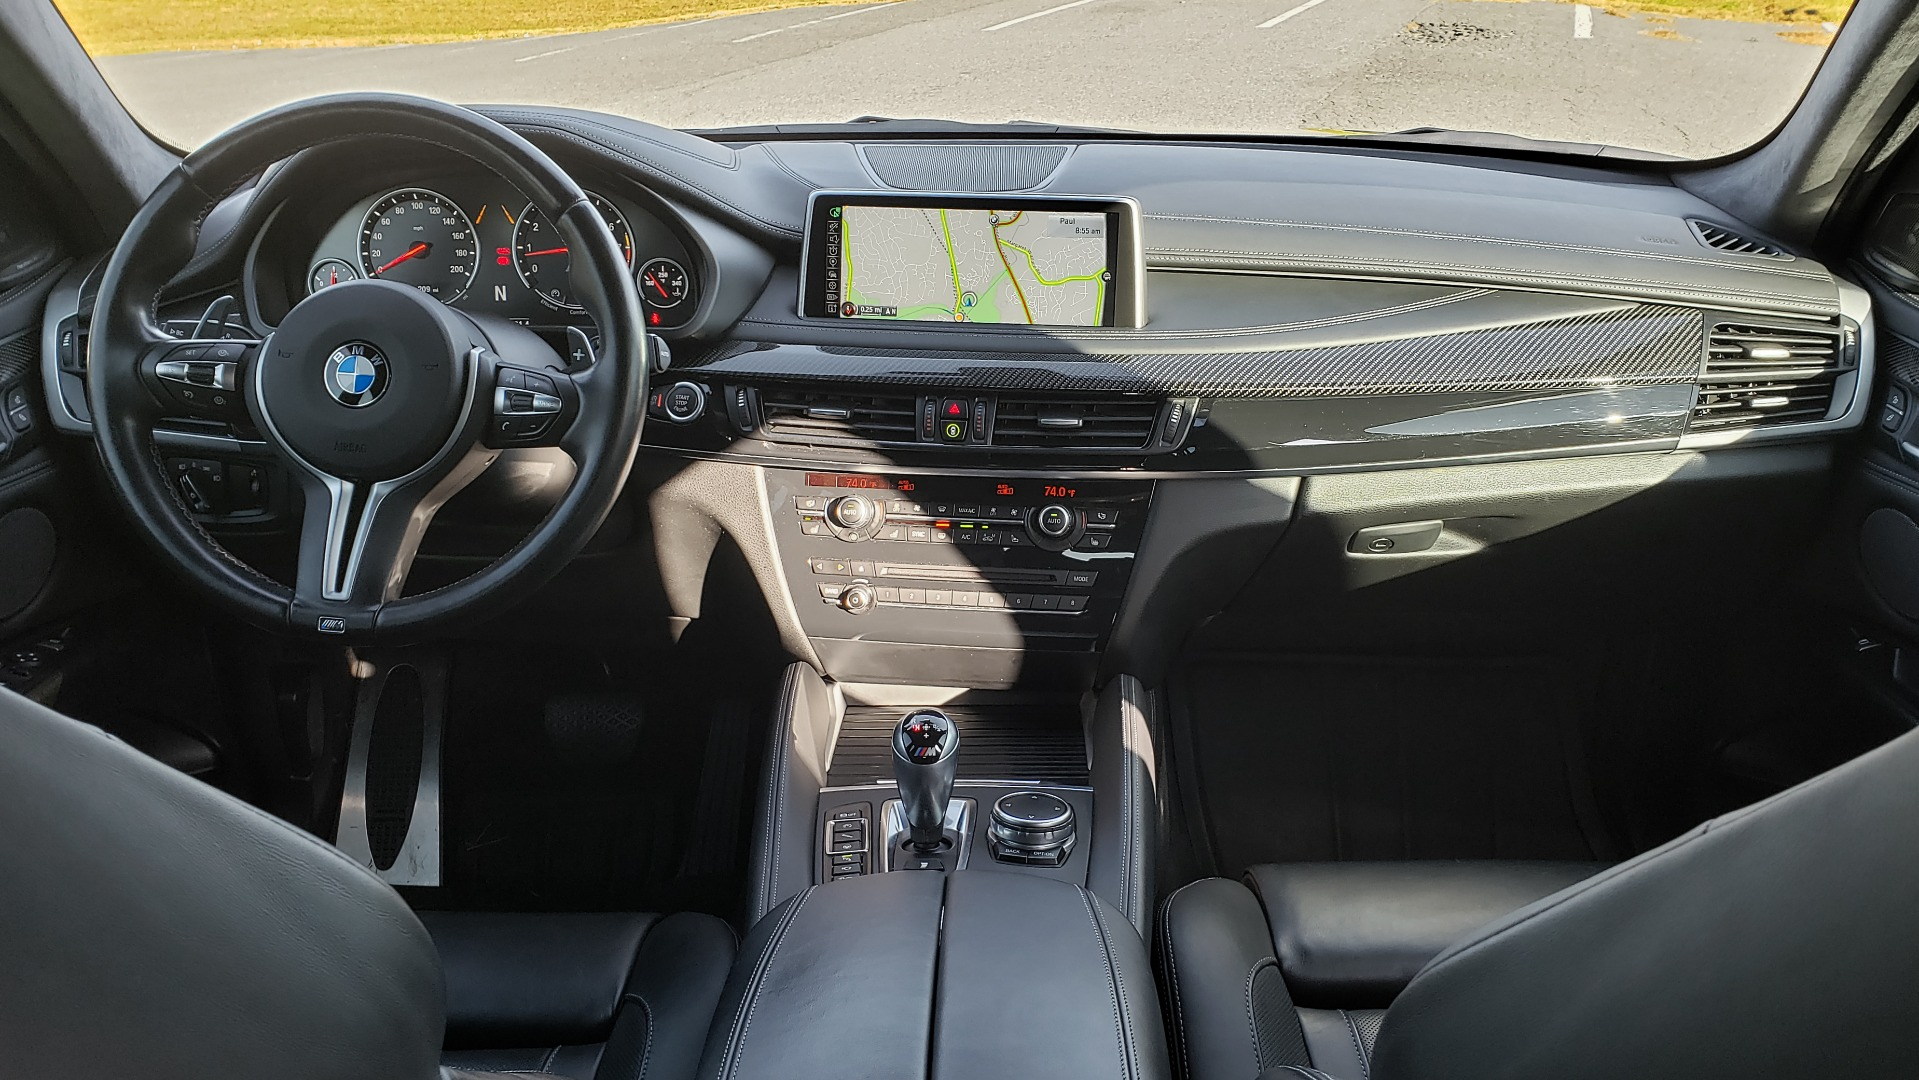 Used 2016 BMW X6 M EXEC PKG / DRVR ASST / NAV / SUNROOF / BLIND SPOT / REARVIEW for sale Sold at Formula Imports in Charlotte NC 28227 83